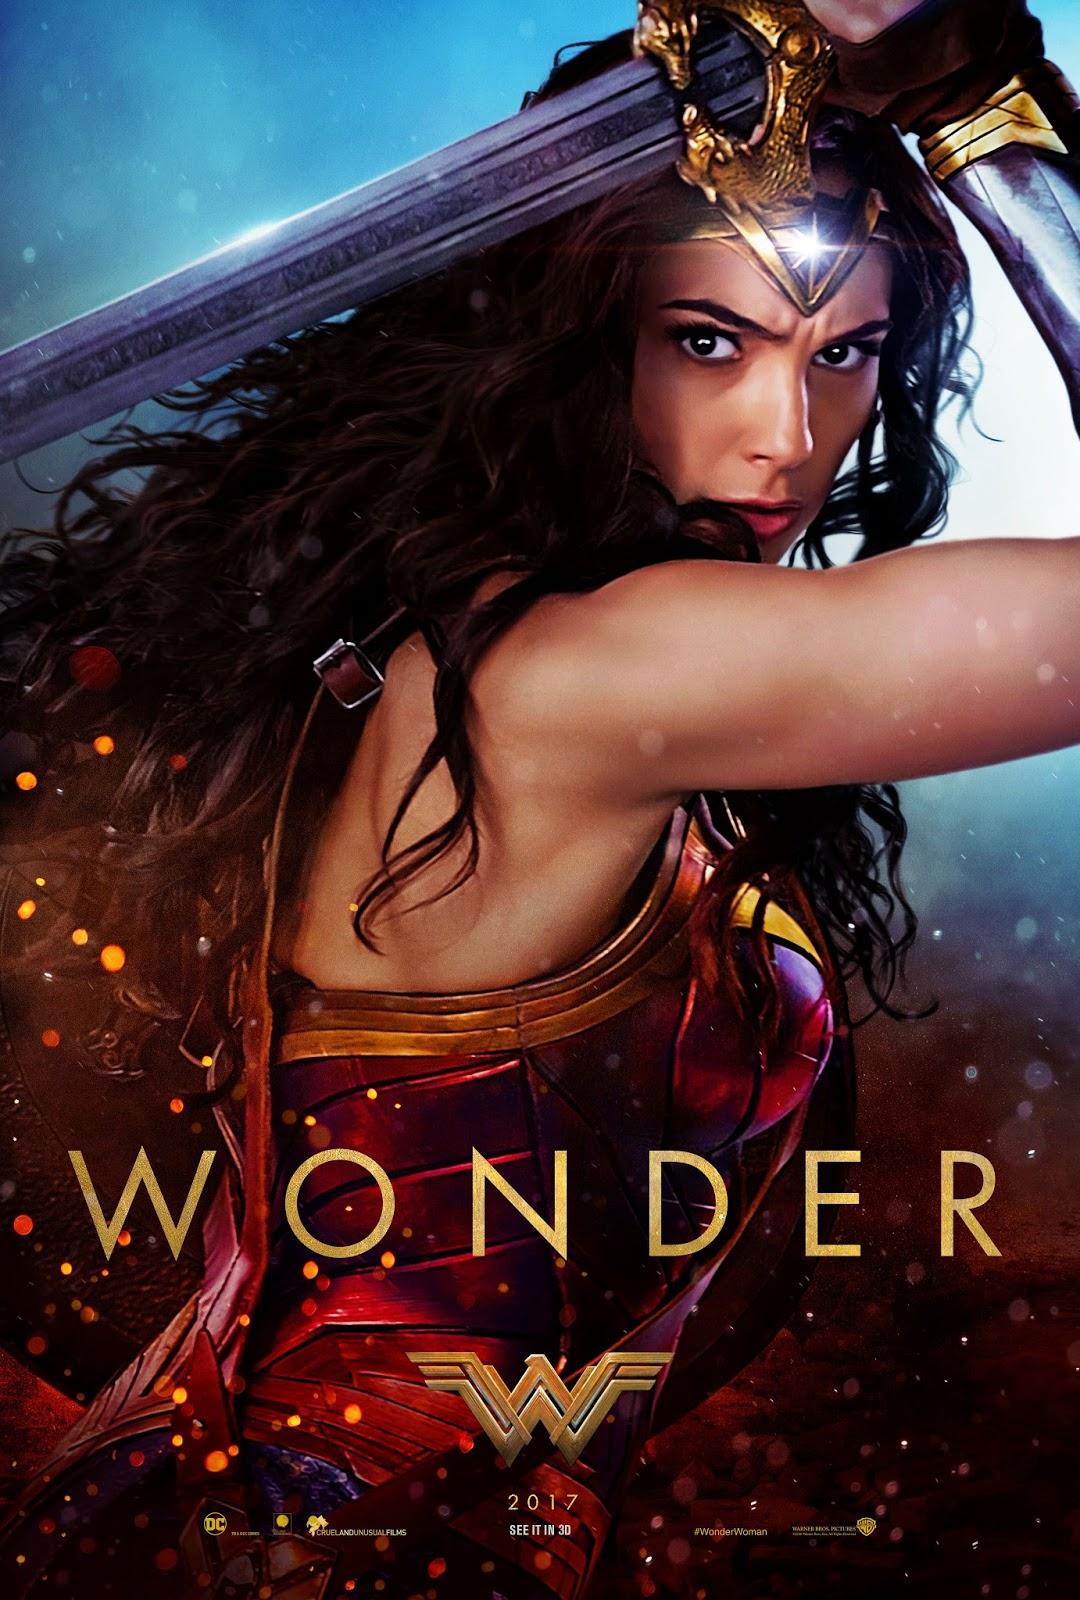 putlocker watch free wonder woman movie online full hd